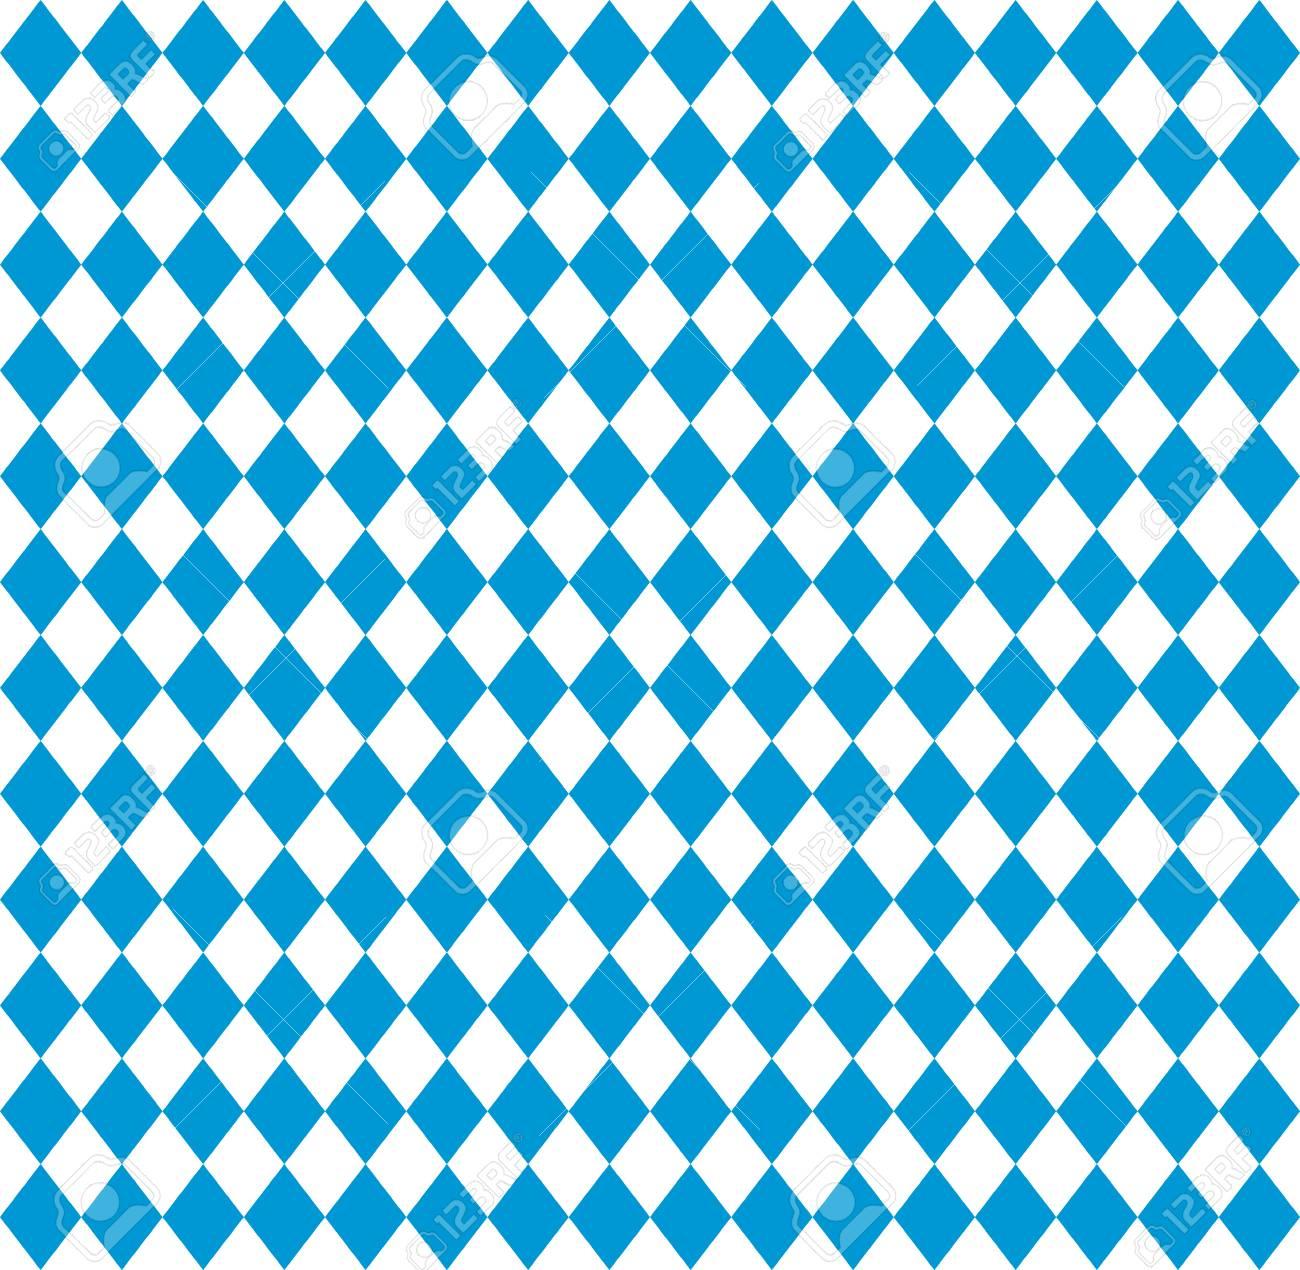 Oktoberfest Bavarian flag symbol background - 84364334